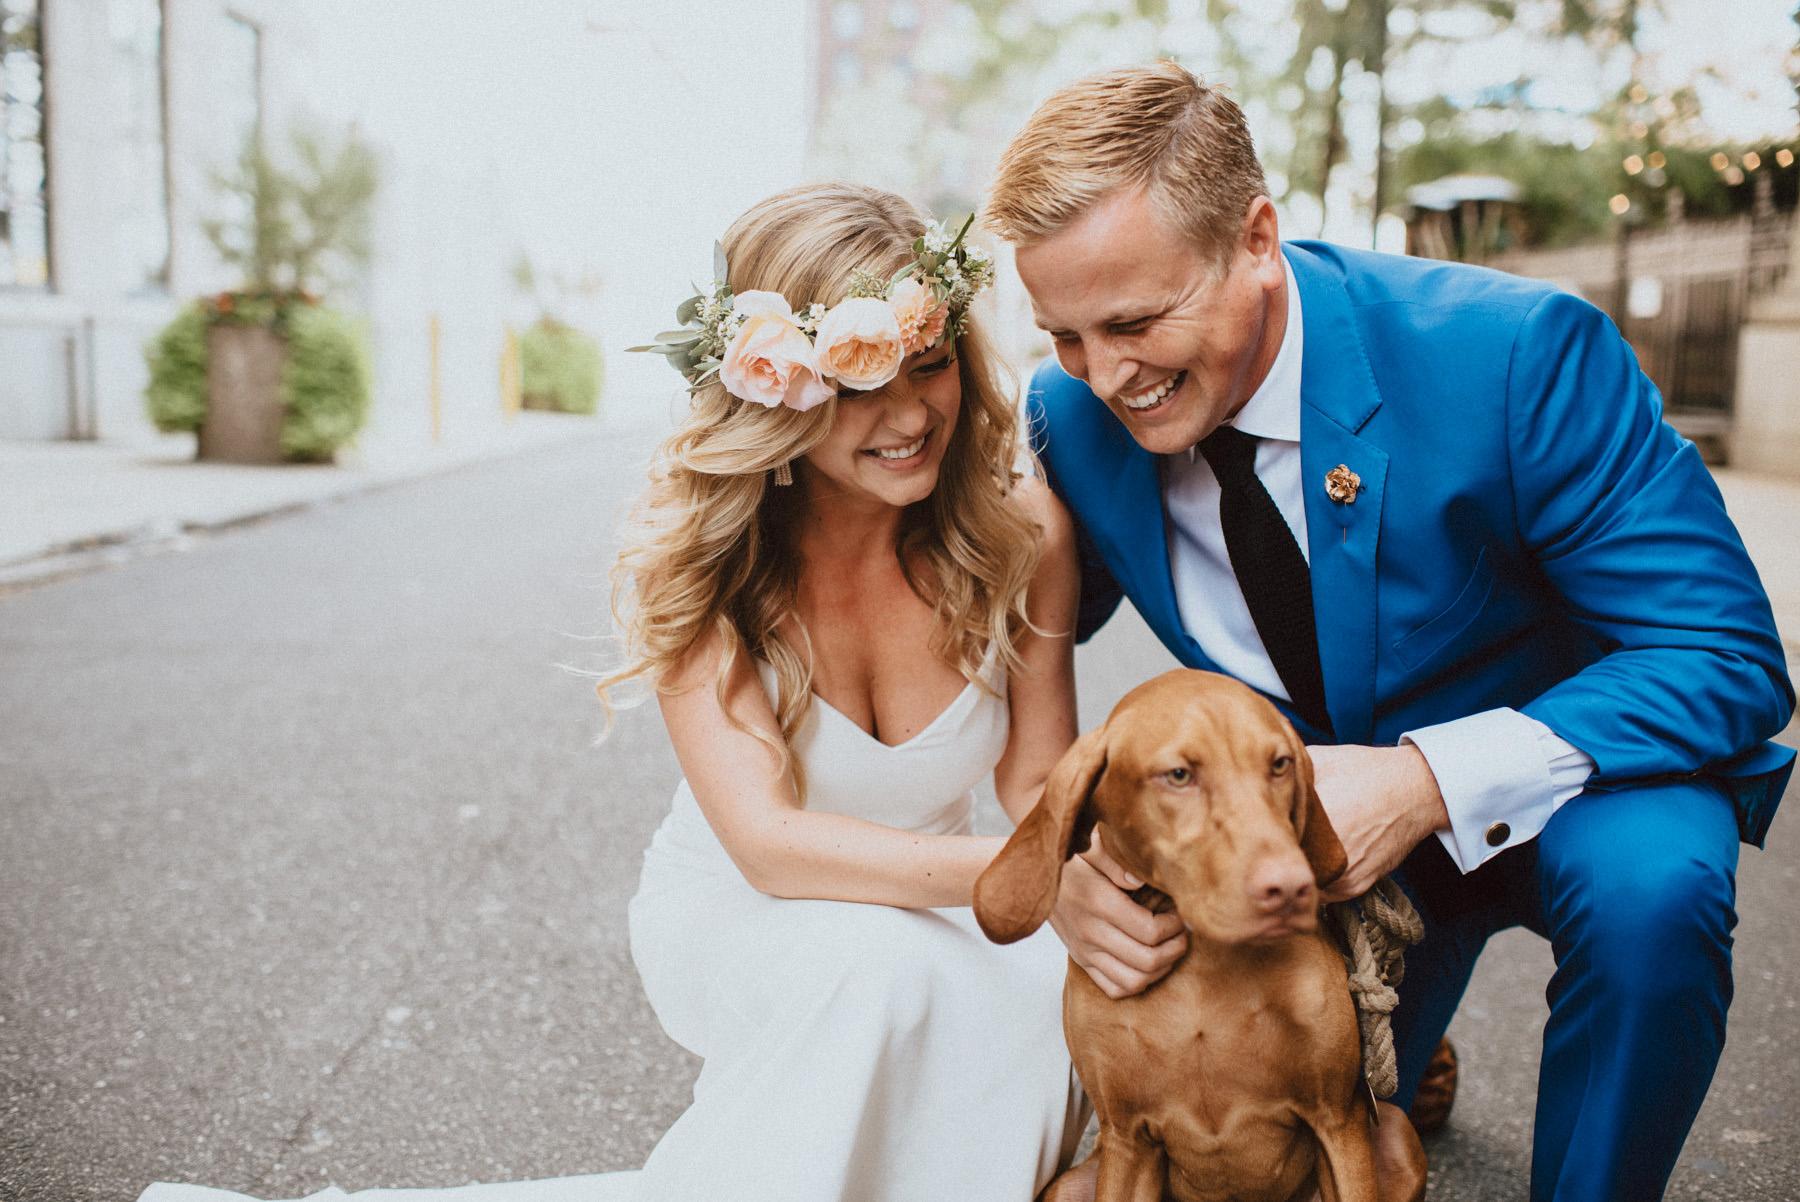 180-la-cherie-philly-wedding-1.jpg